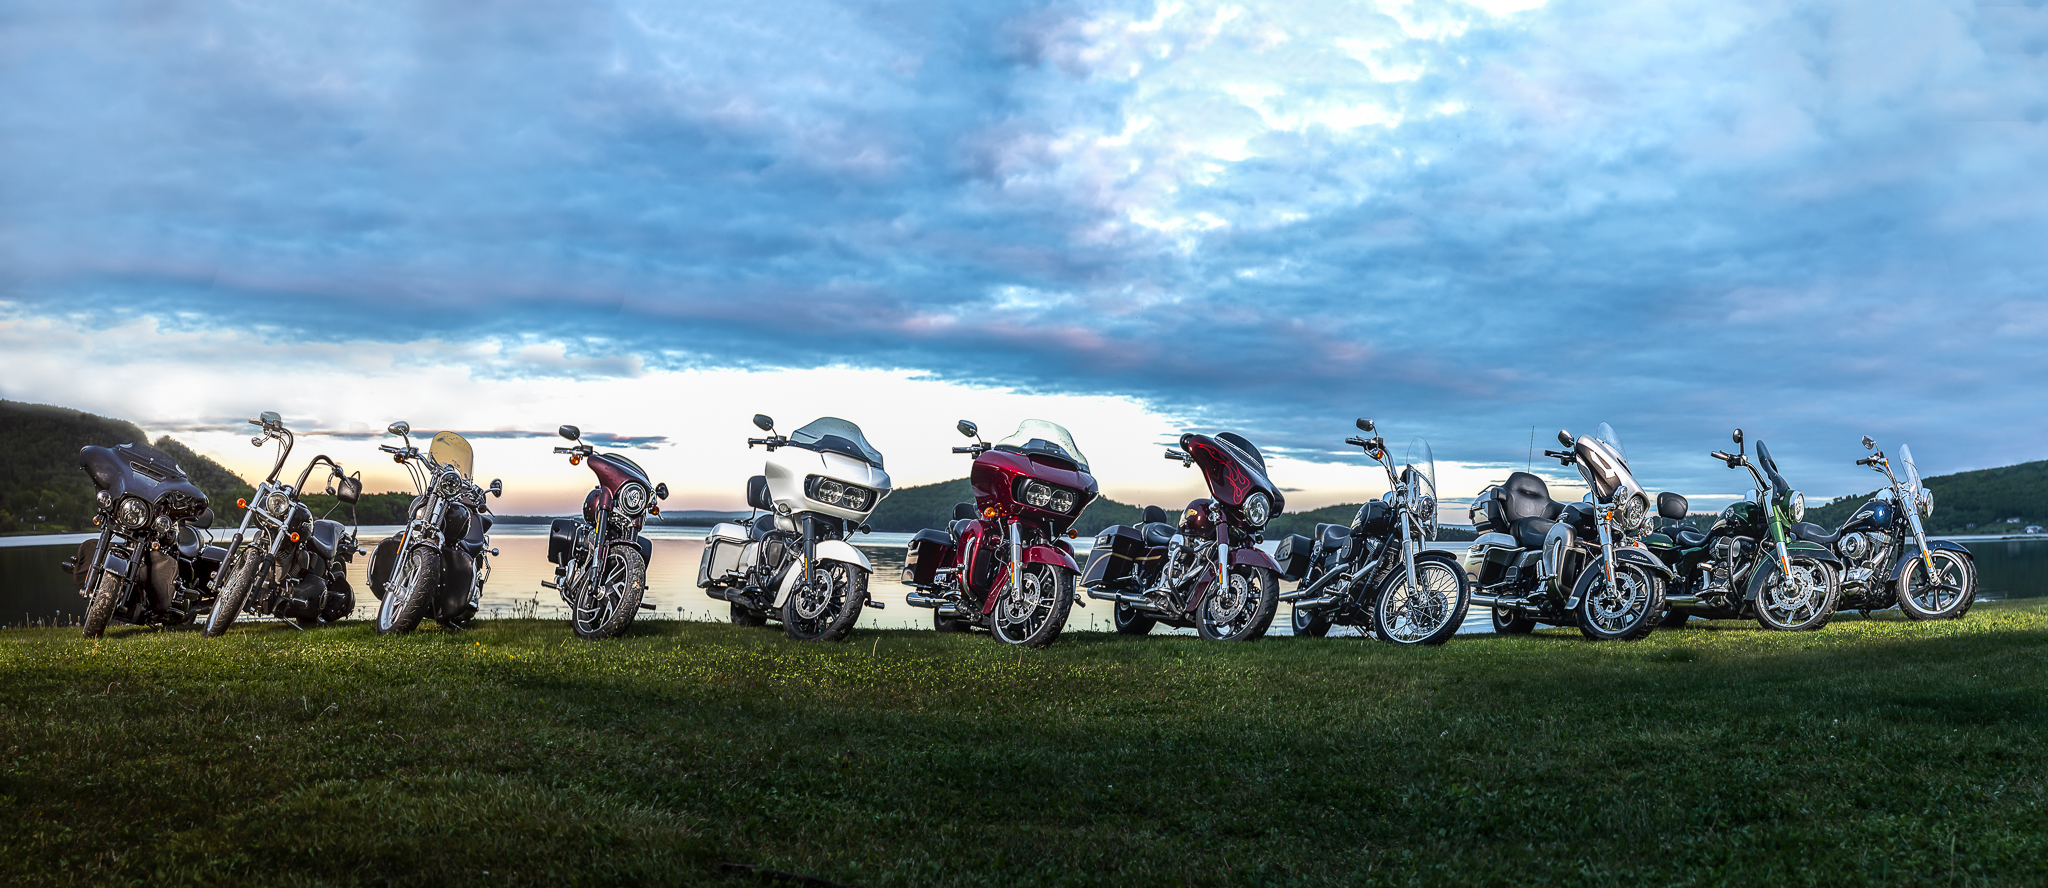 2018 Bike Lineup